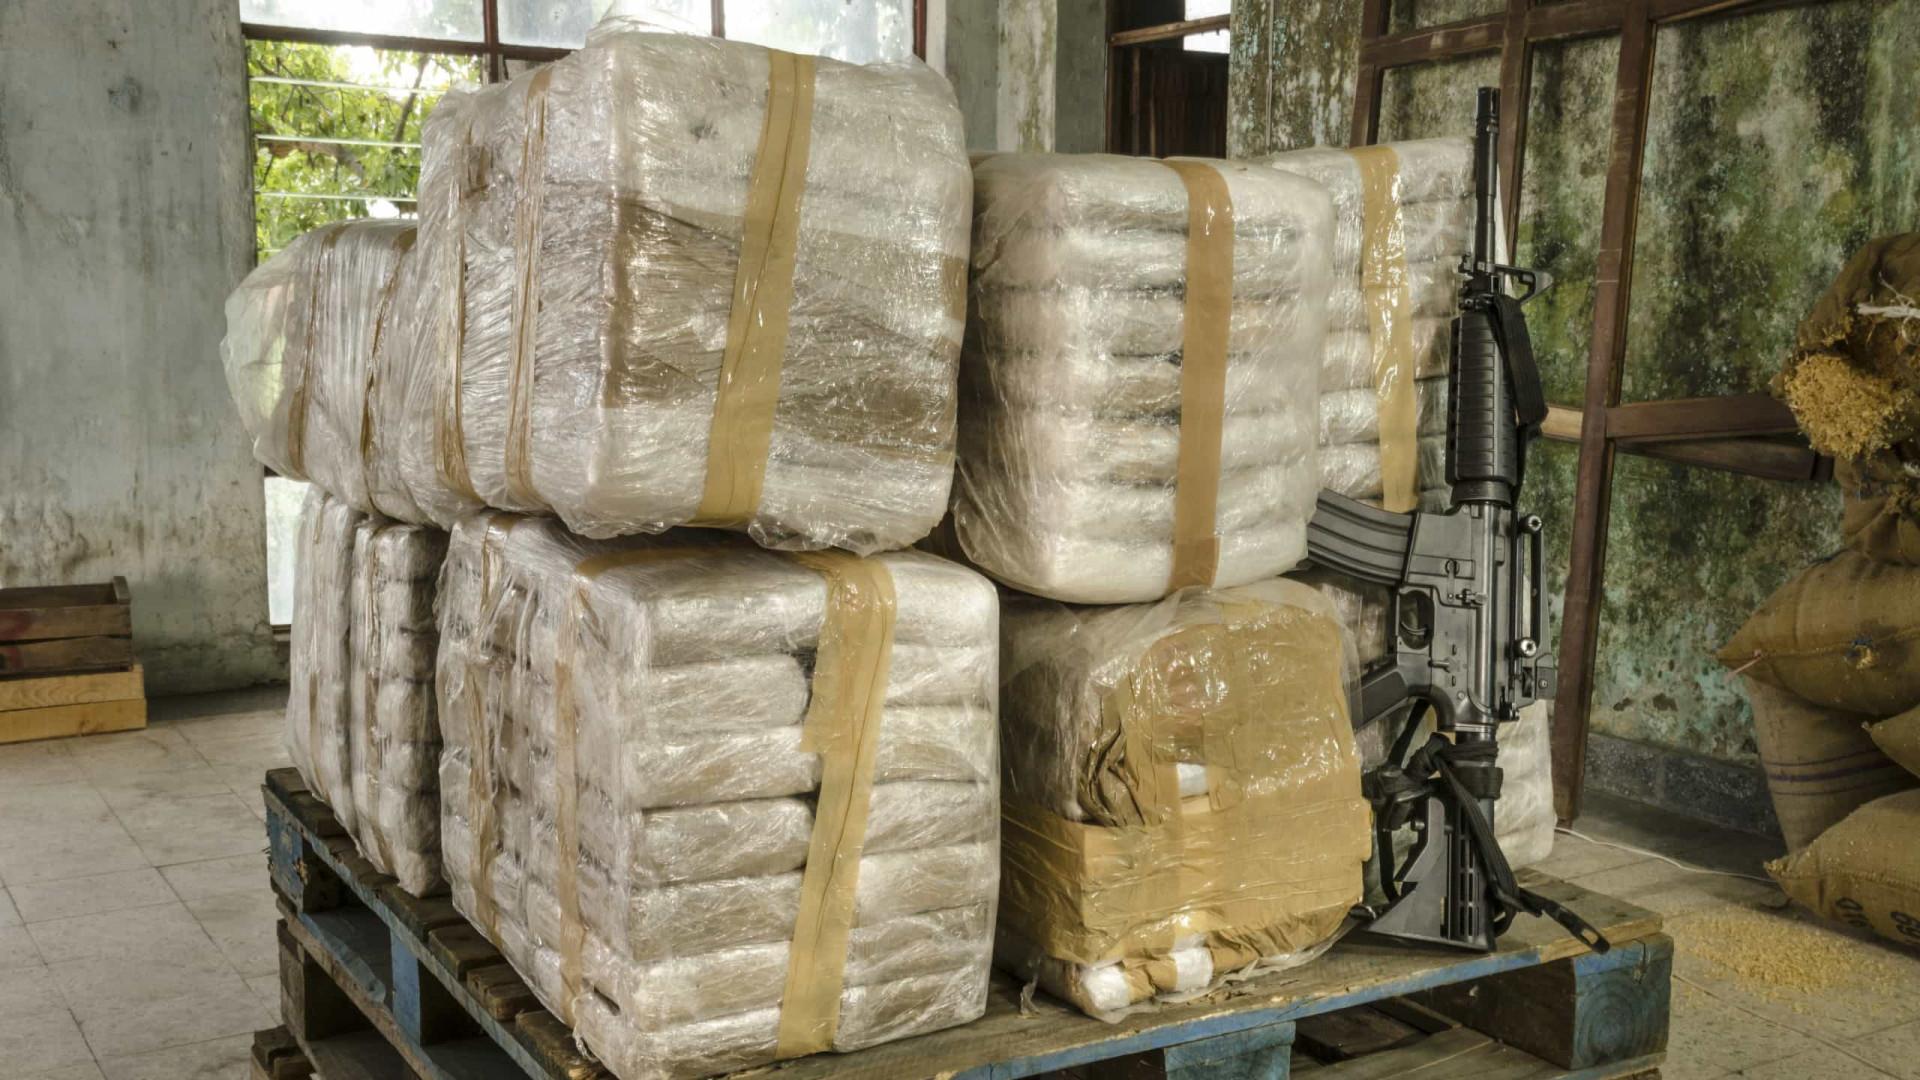 Receita apreende 21 ton de produtos contrafeitos no porto de Santos